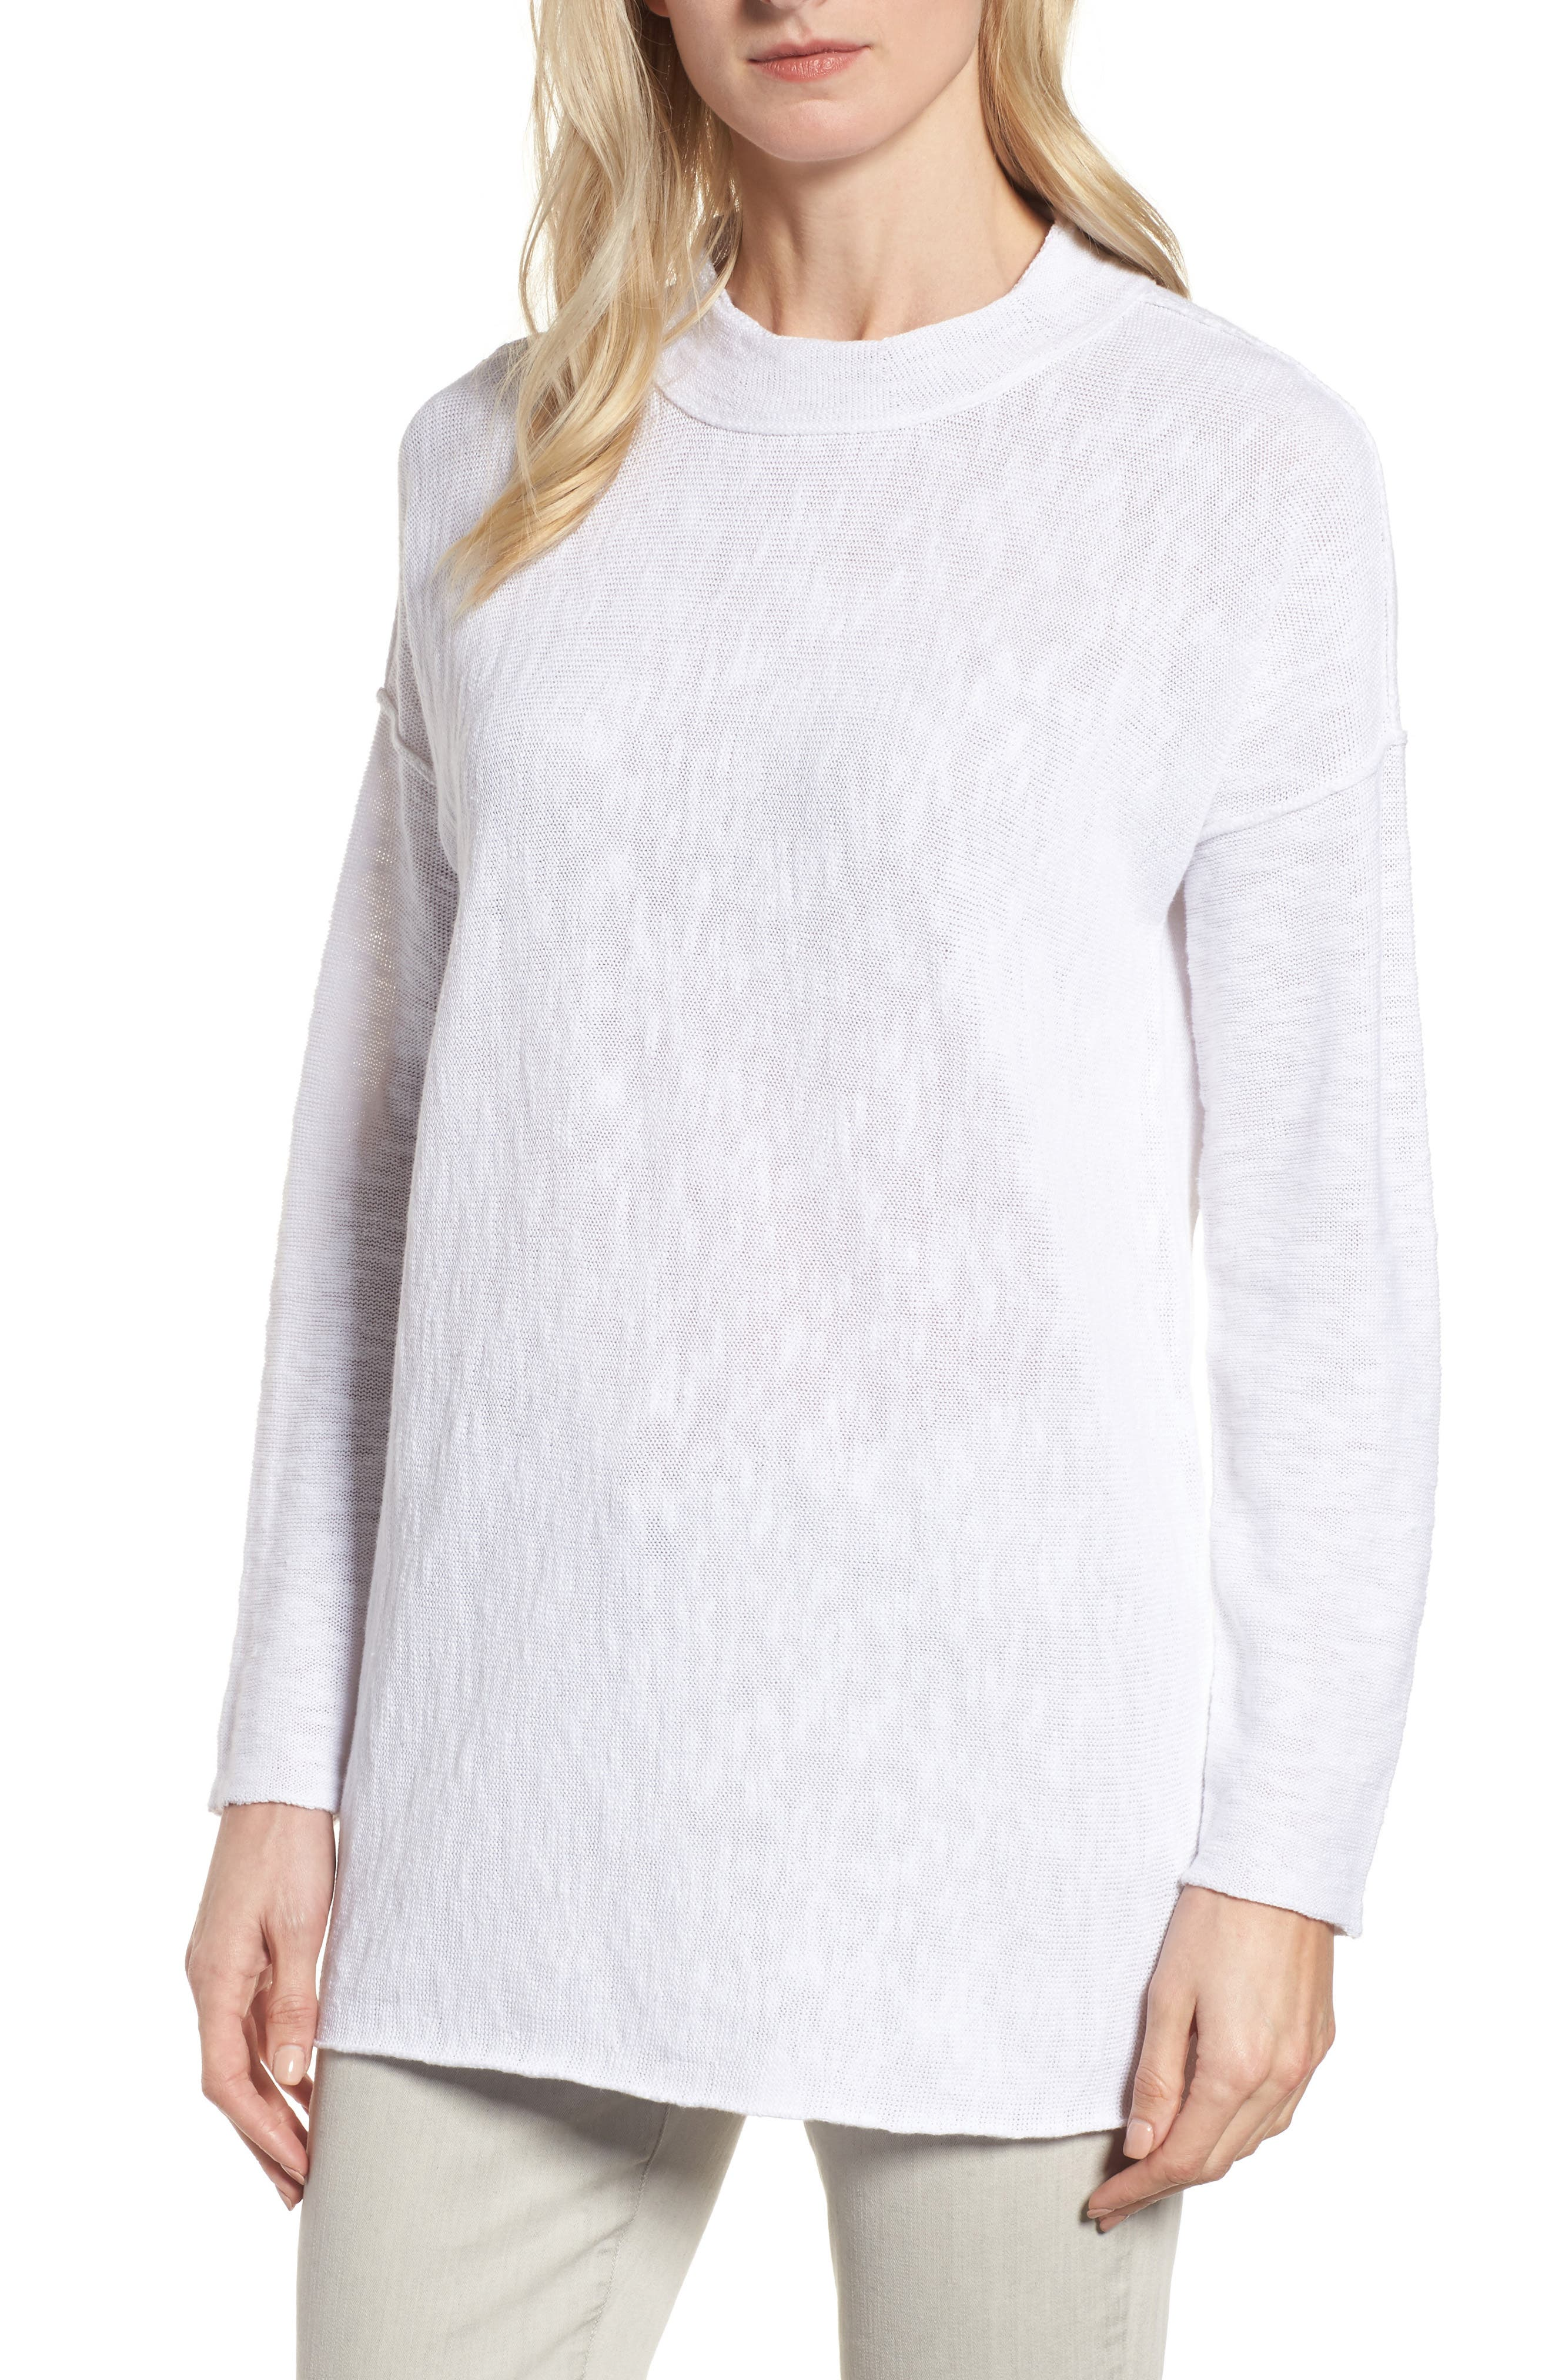 Organic Linen & Cotton Sweater,                             Main thumbnail 1, color,                             100